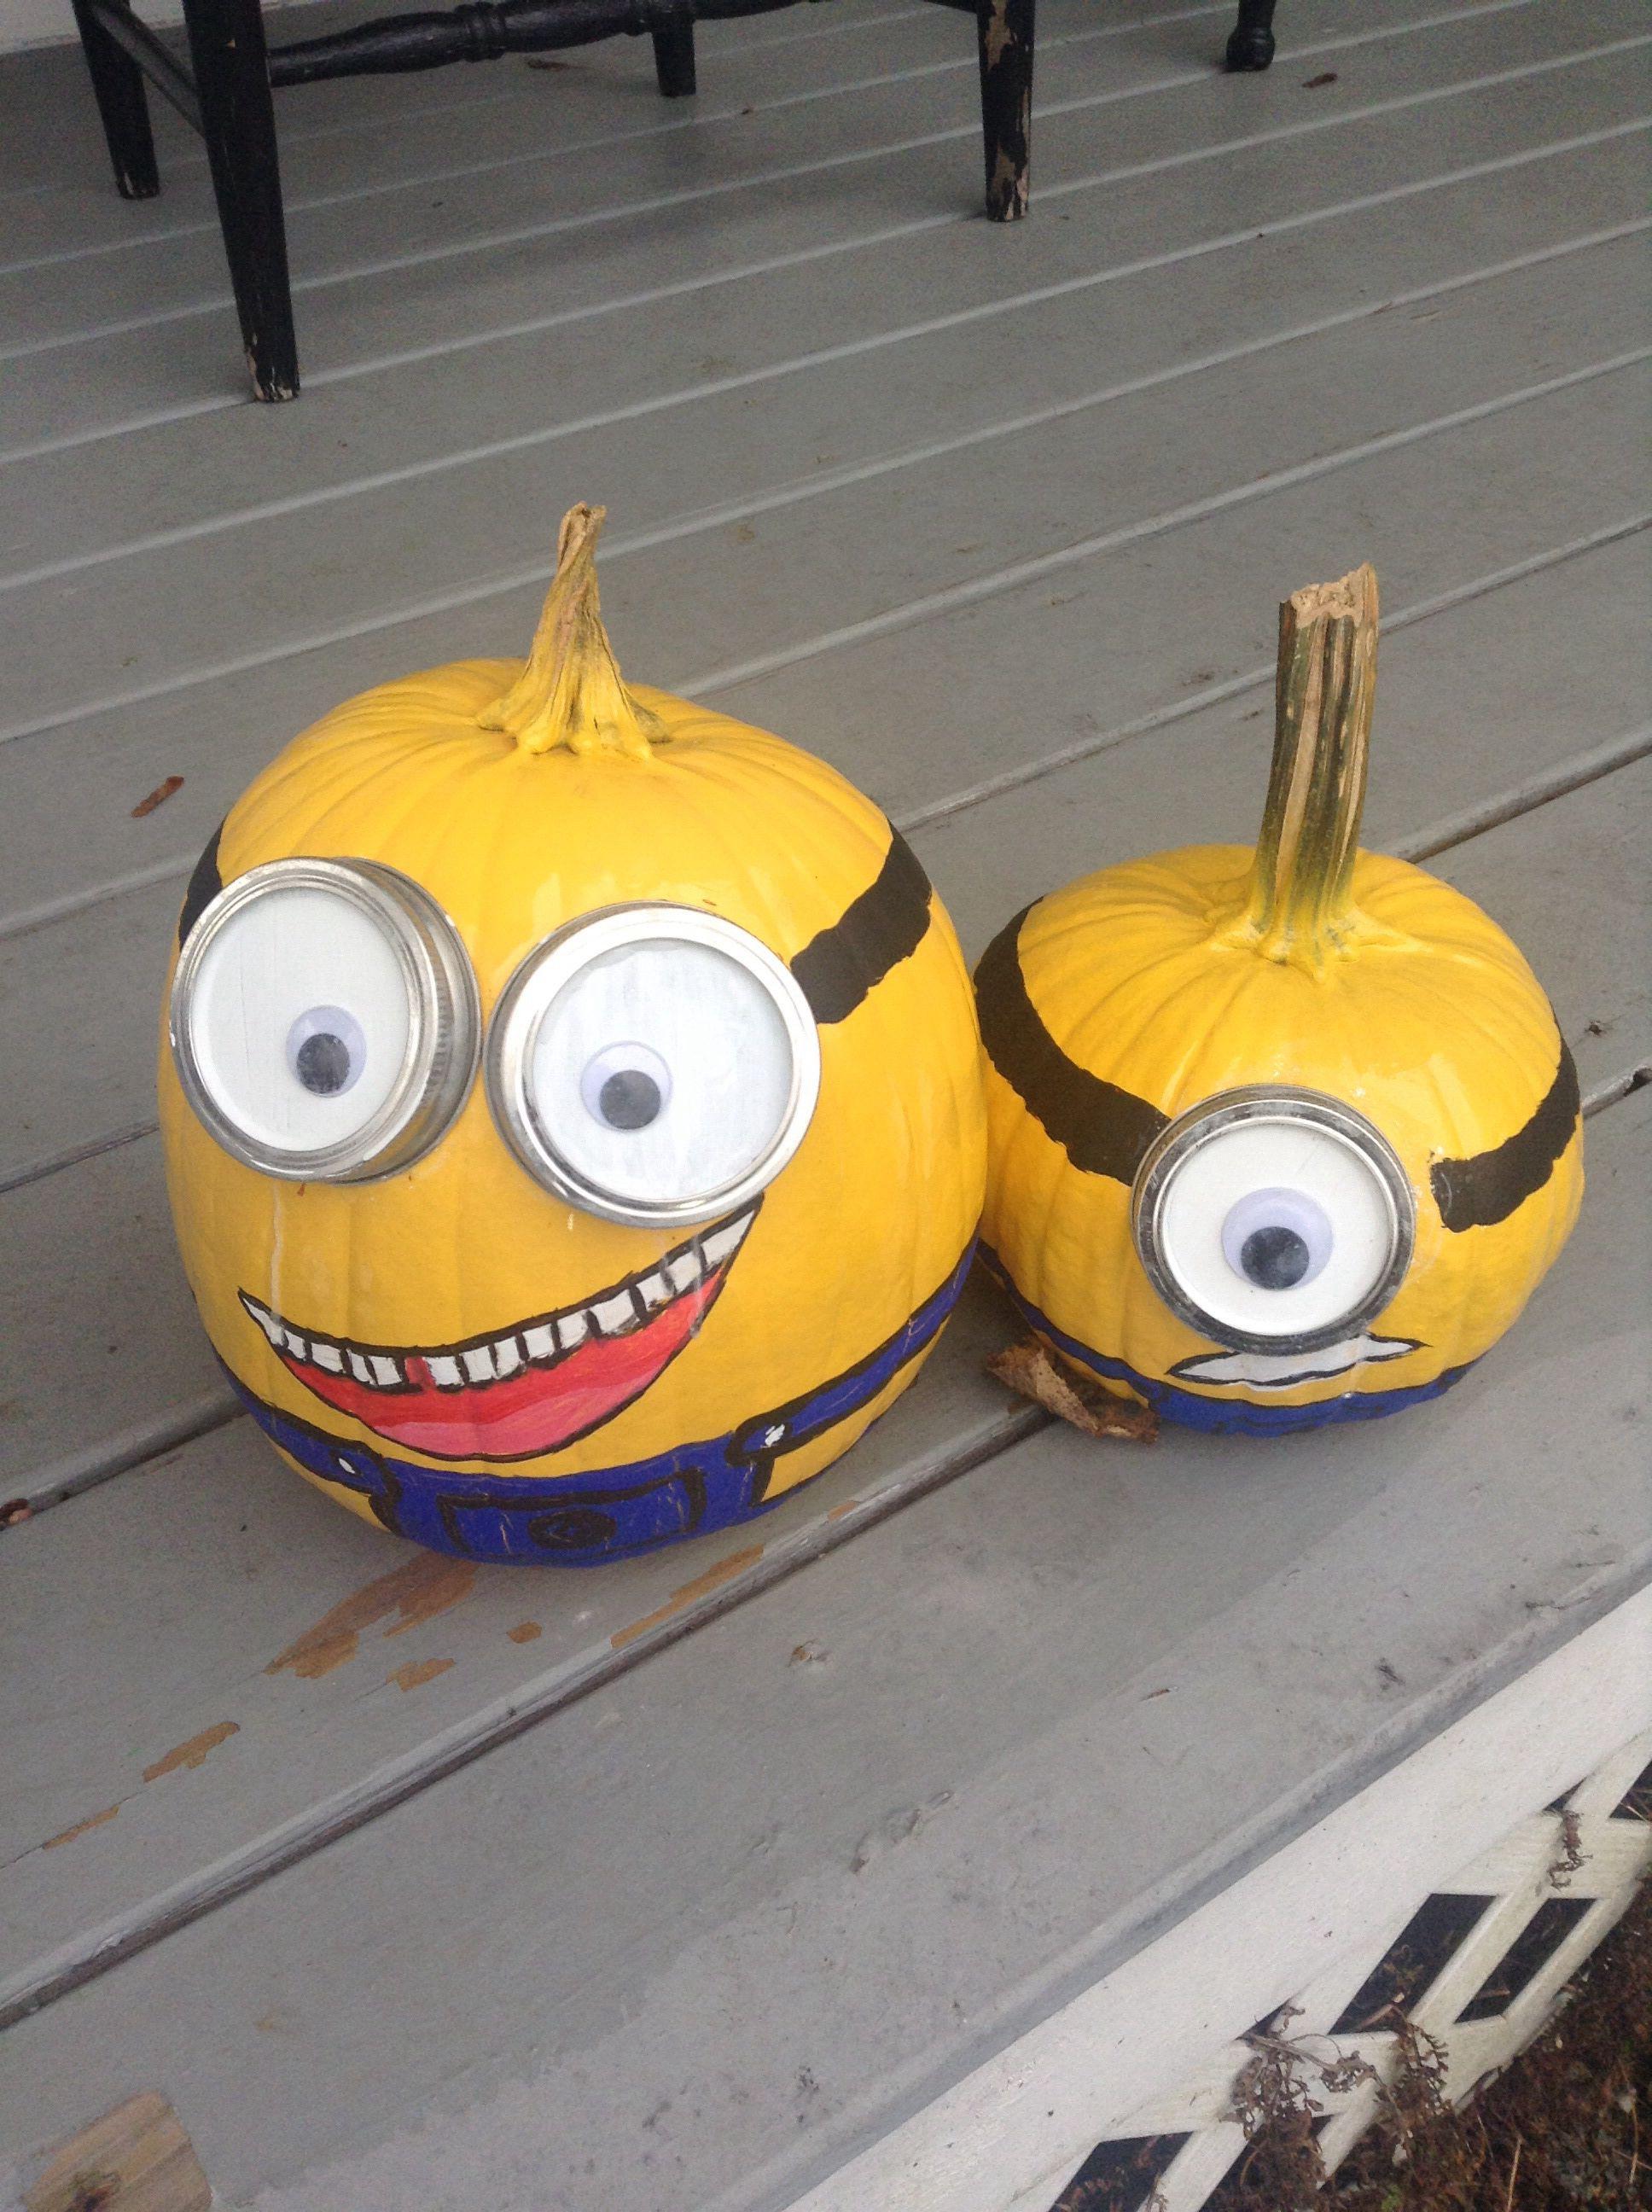 Decorated pumpkins